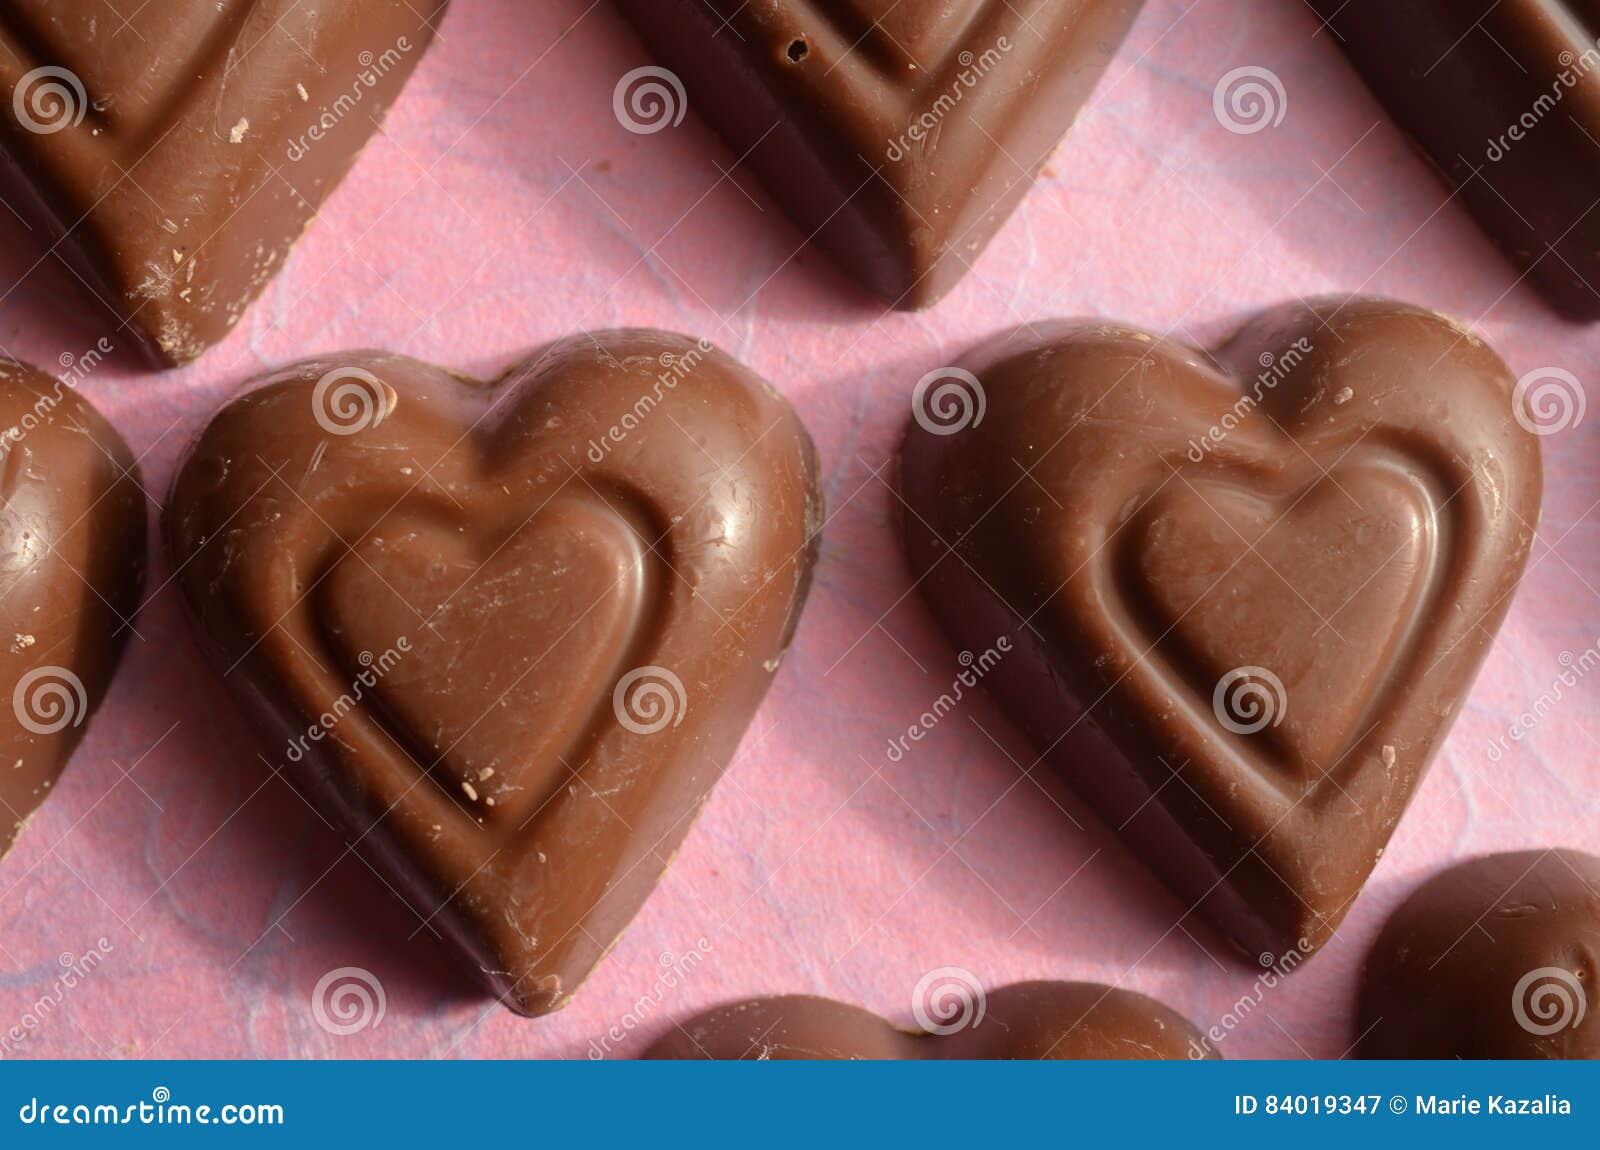 Heart Shape Chocolate Valentines Day Symbols Of Love Stock Image